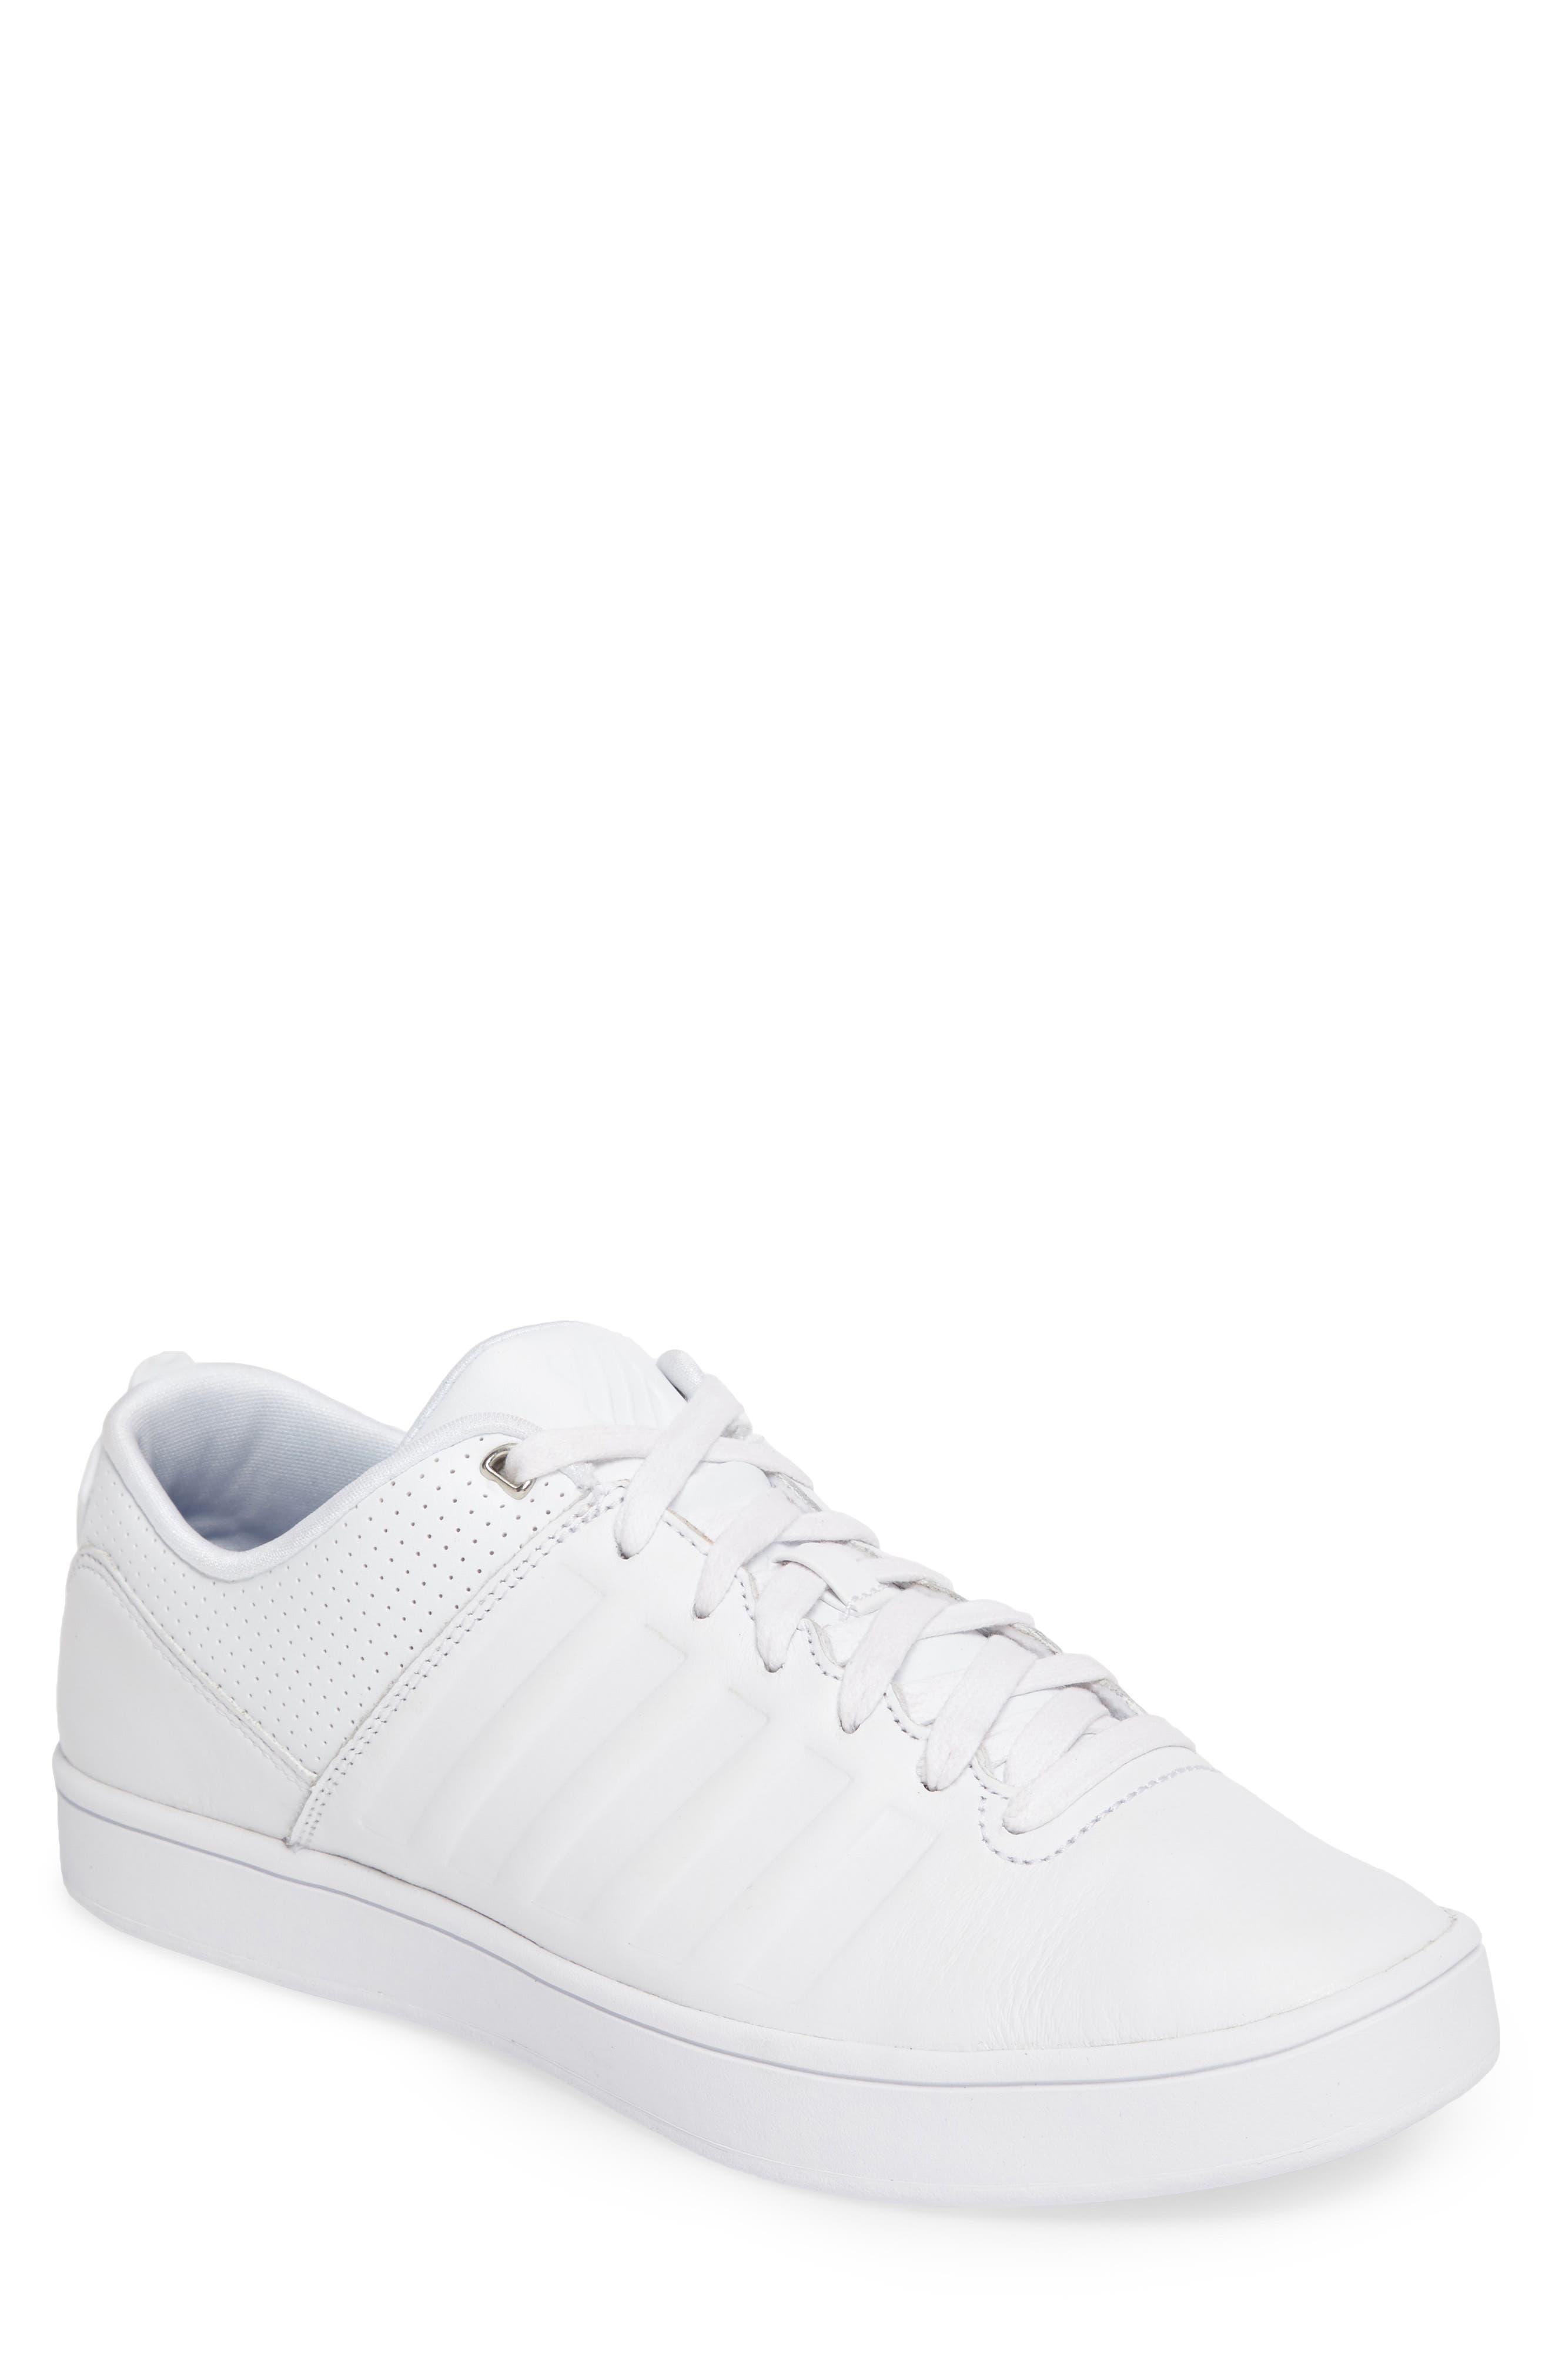 Alternate Image 1 Selected - K-Swiss Court Westan Sneaker (Men)